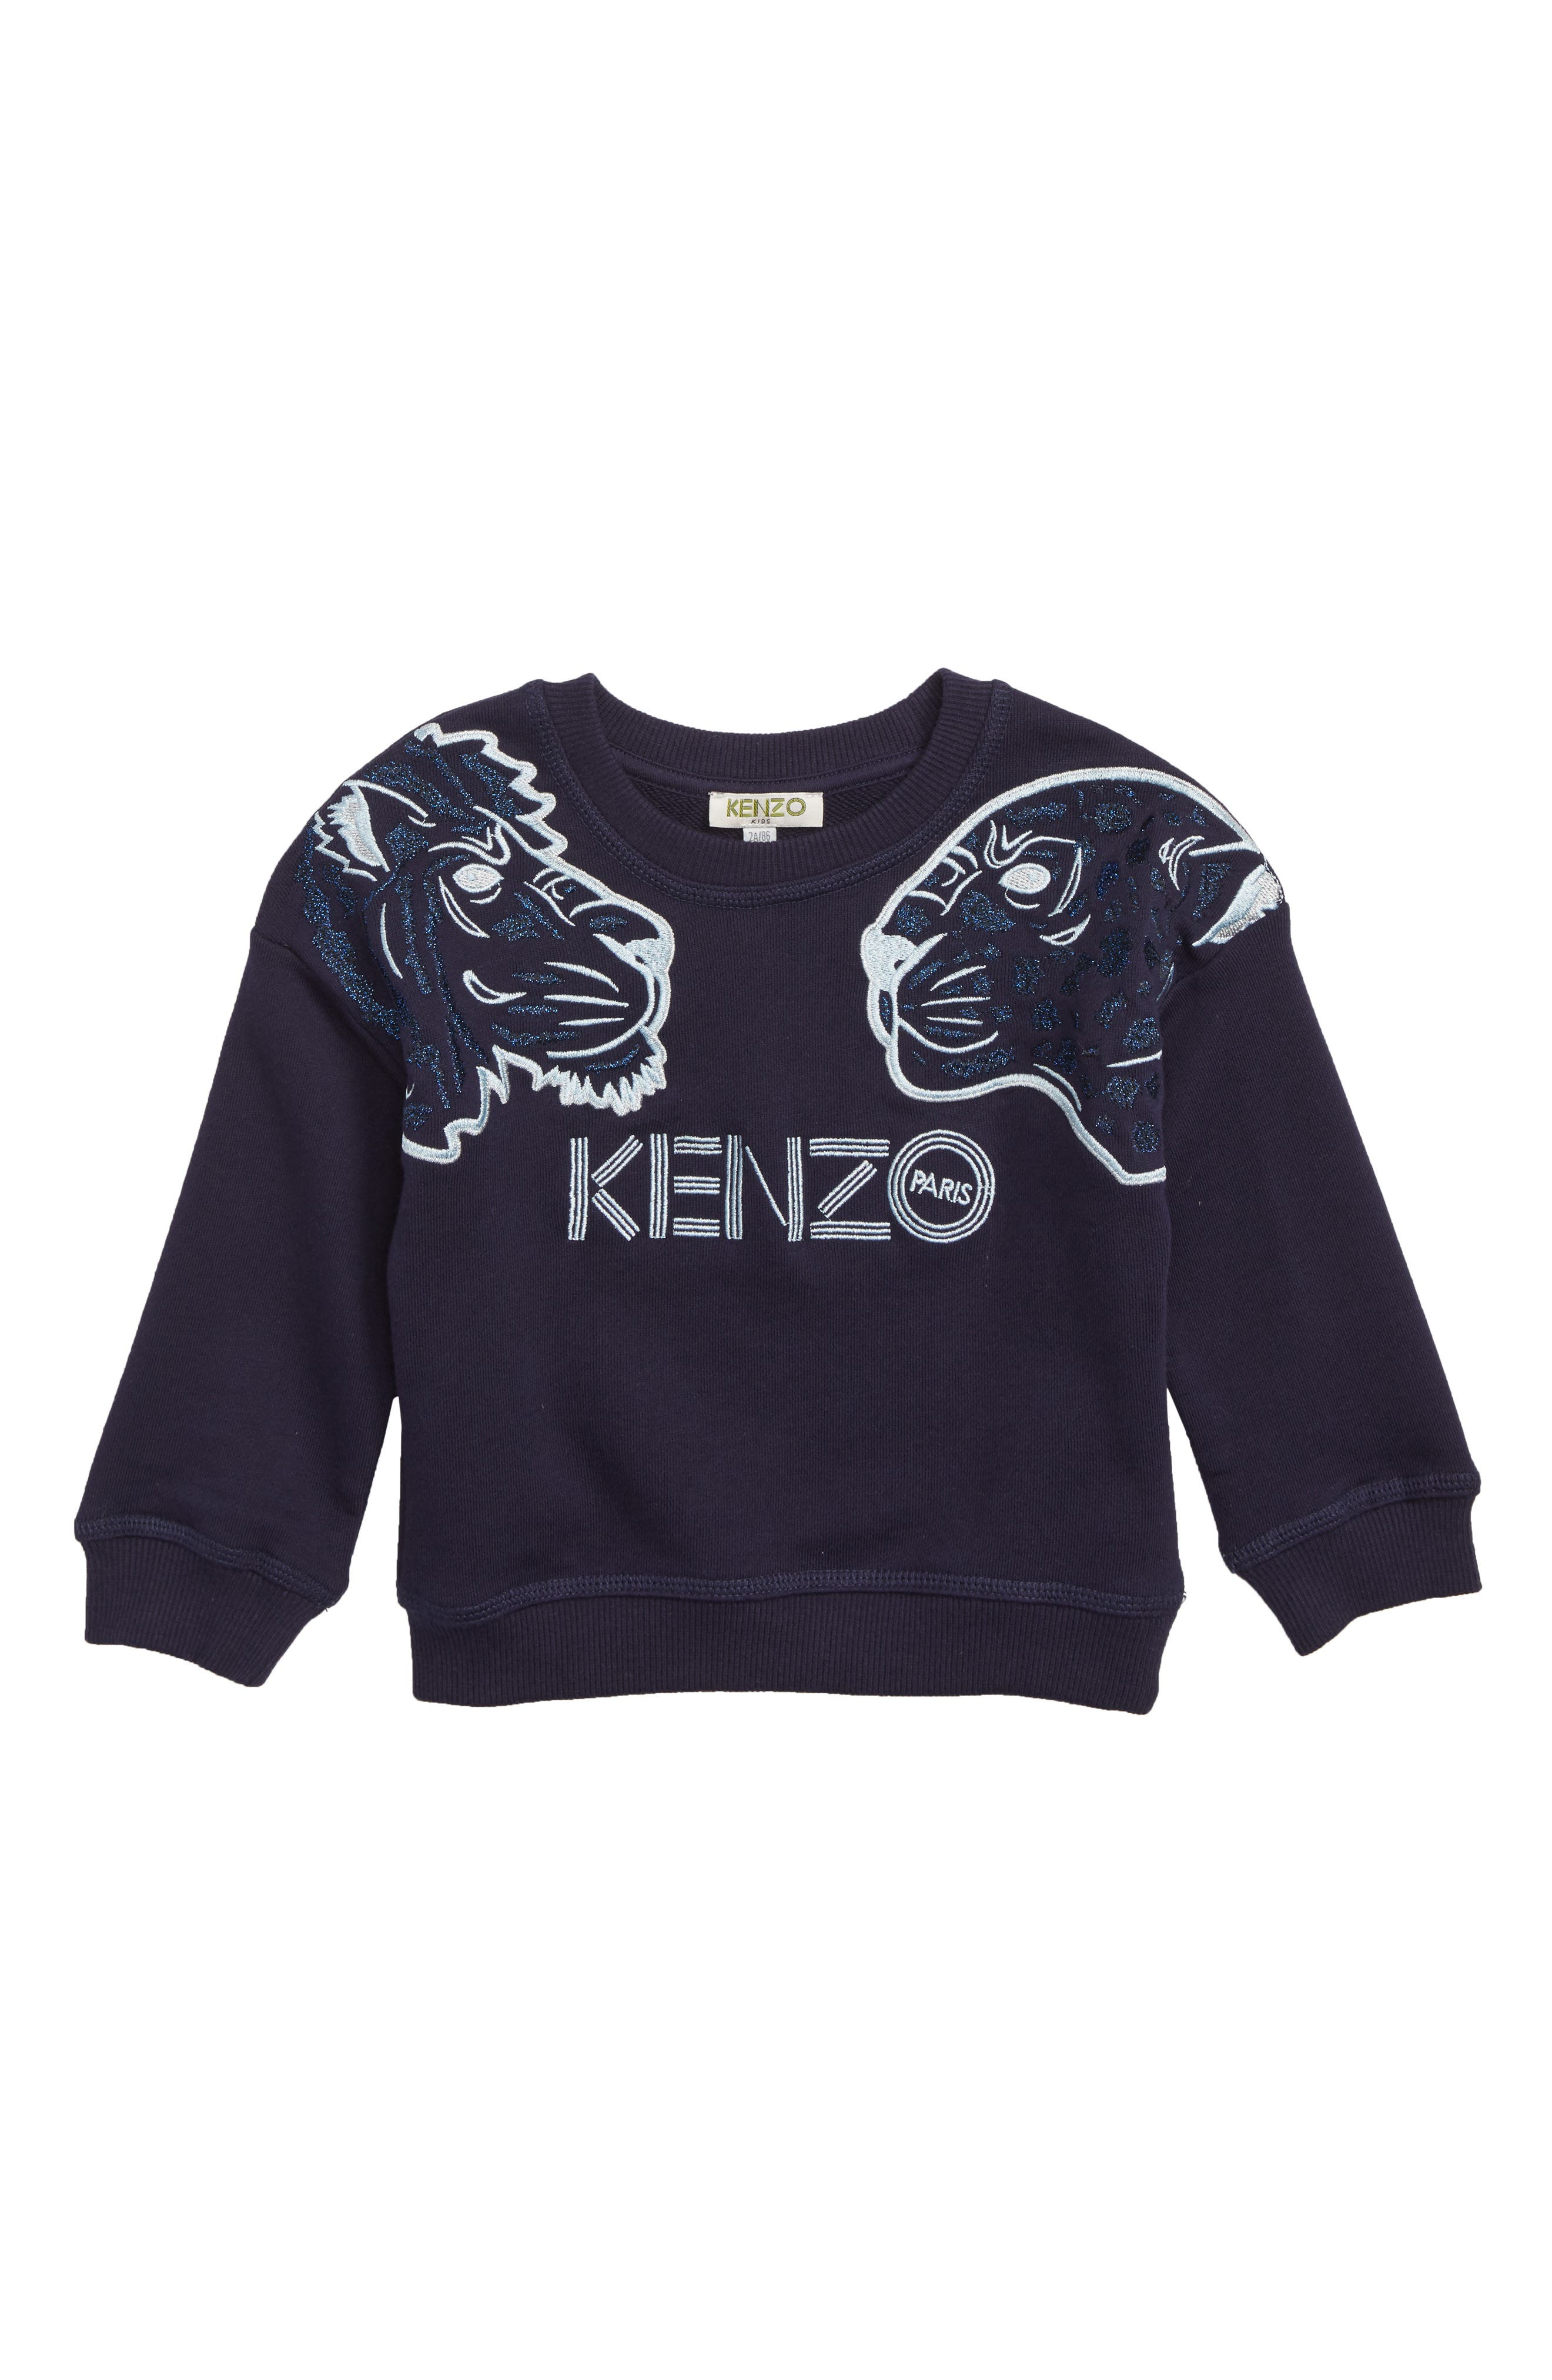 4cb3f8d0a Kids' KENZO | Nordstrom